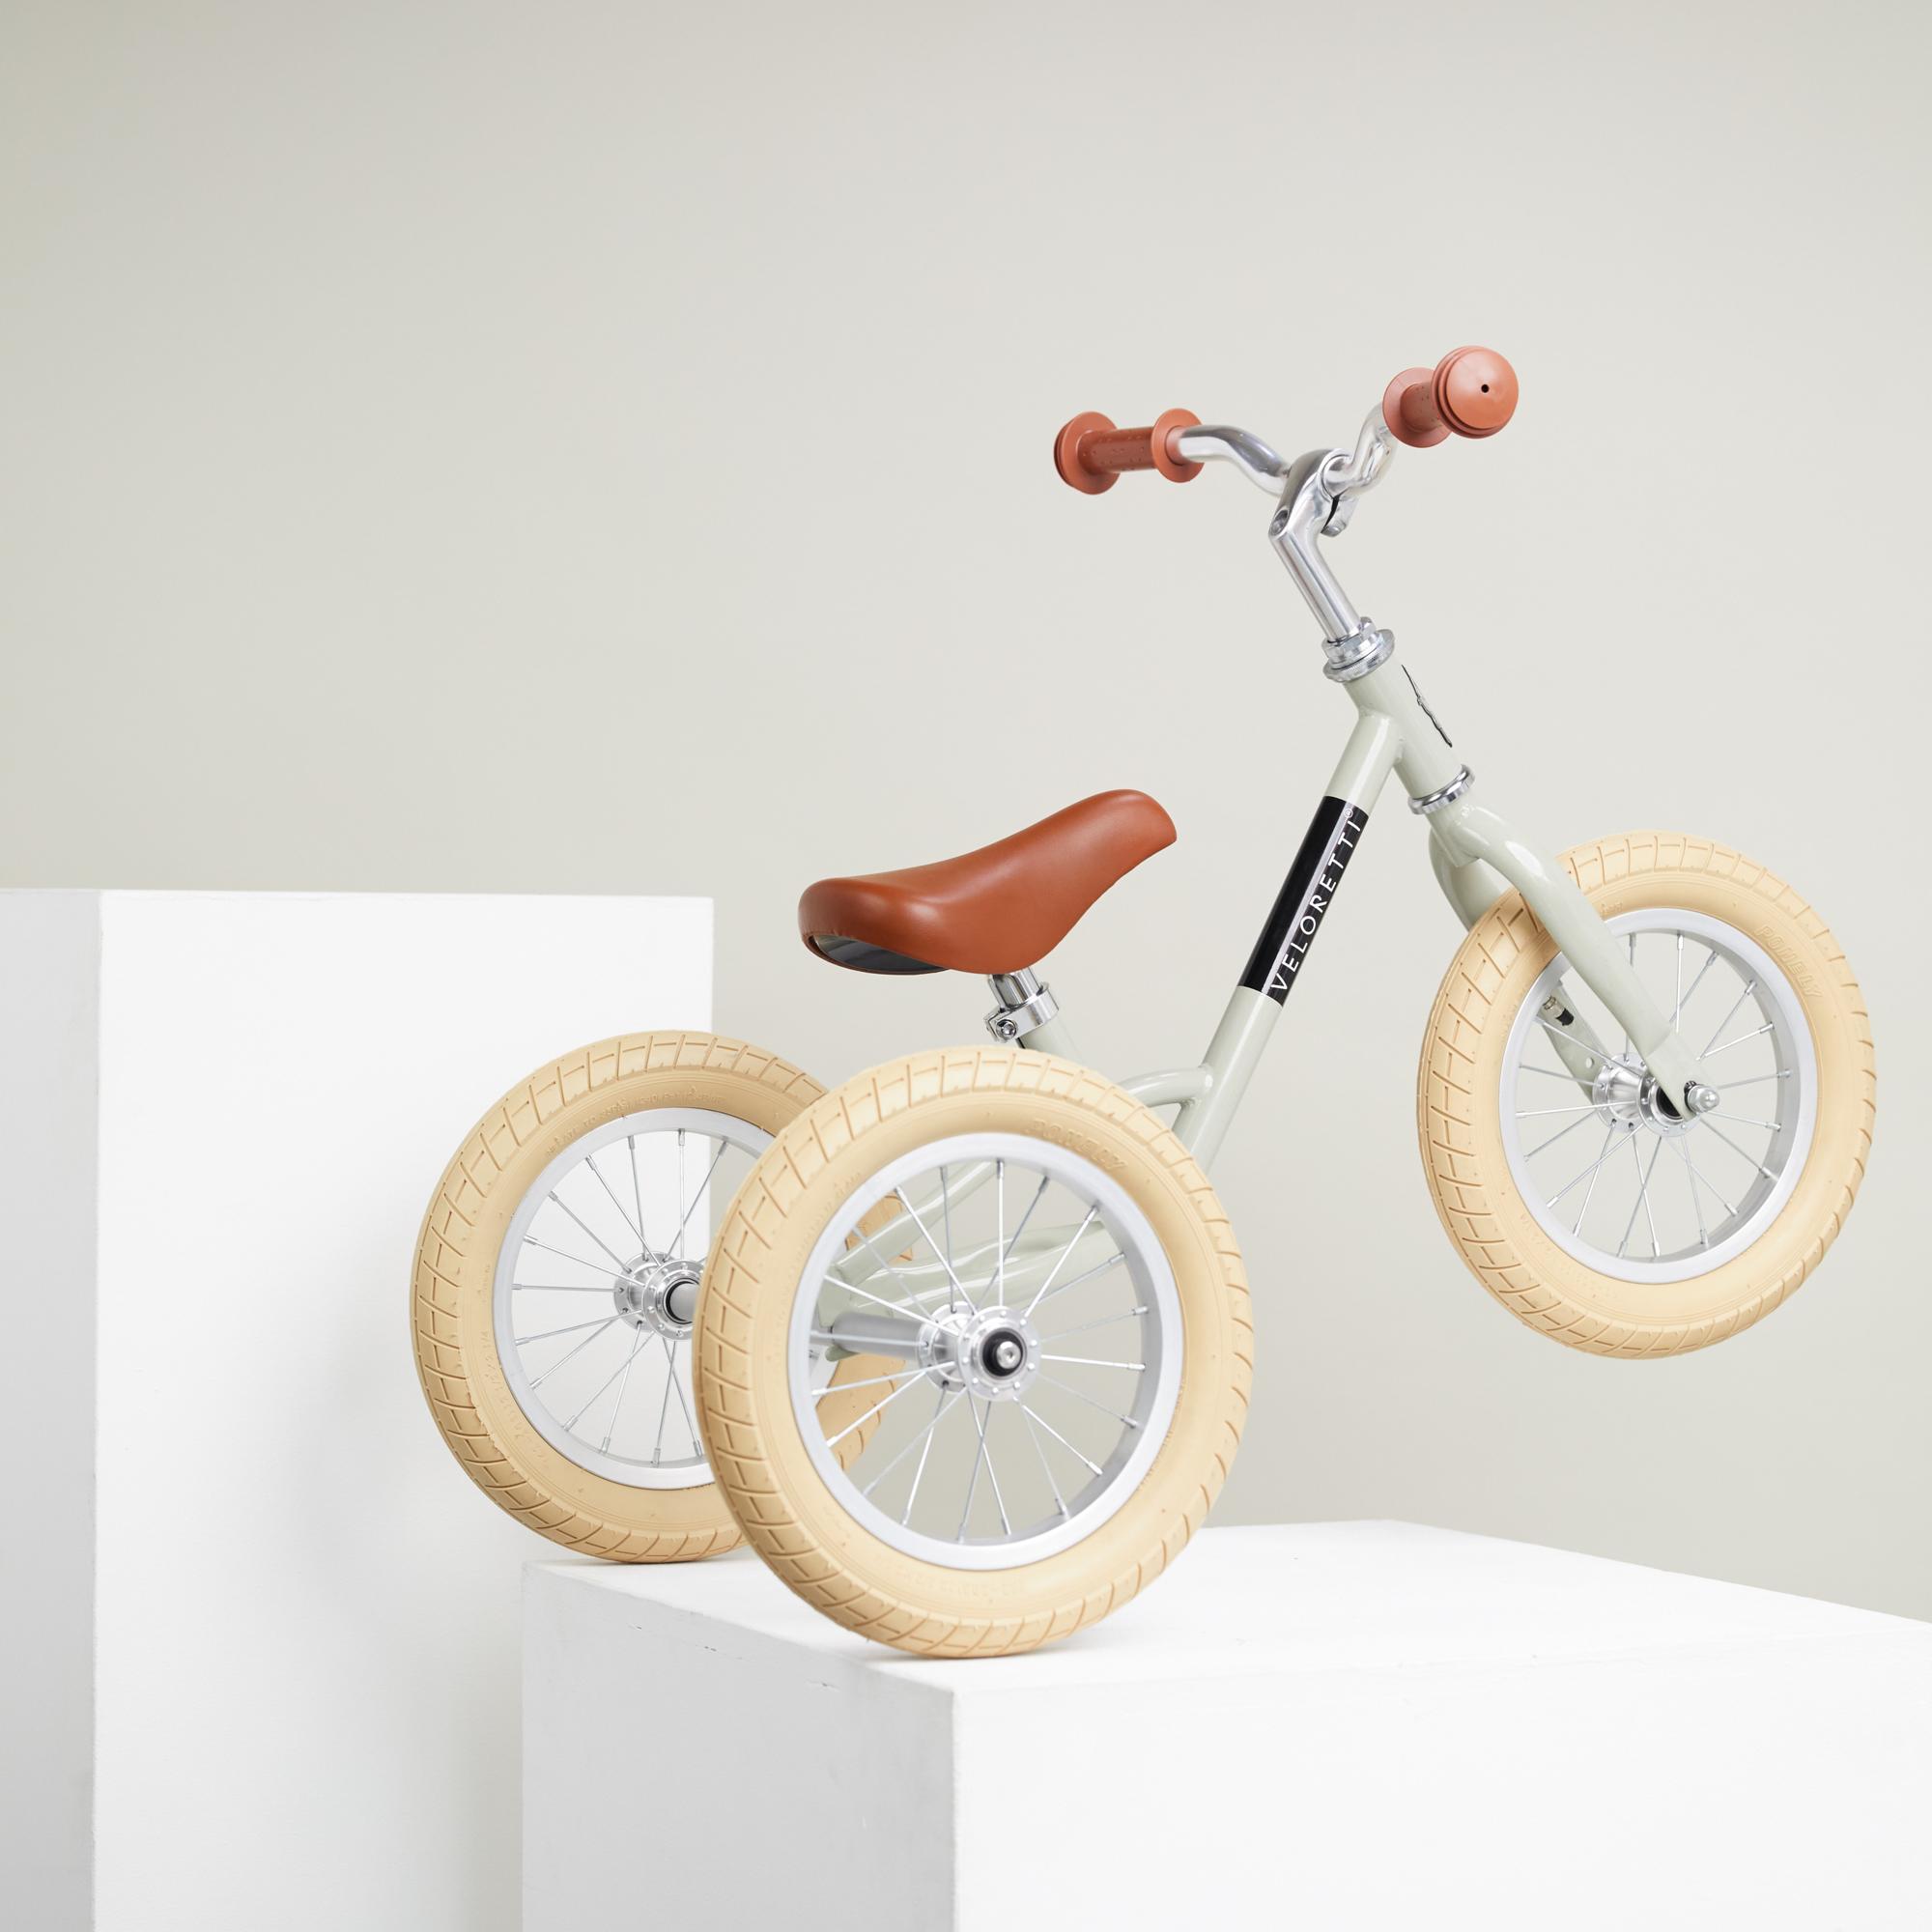 Veloretti_Kids_bikes_28_jan_Tricycle_Pebble_grey_0154_2000x_crop_left.png